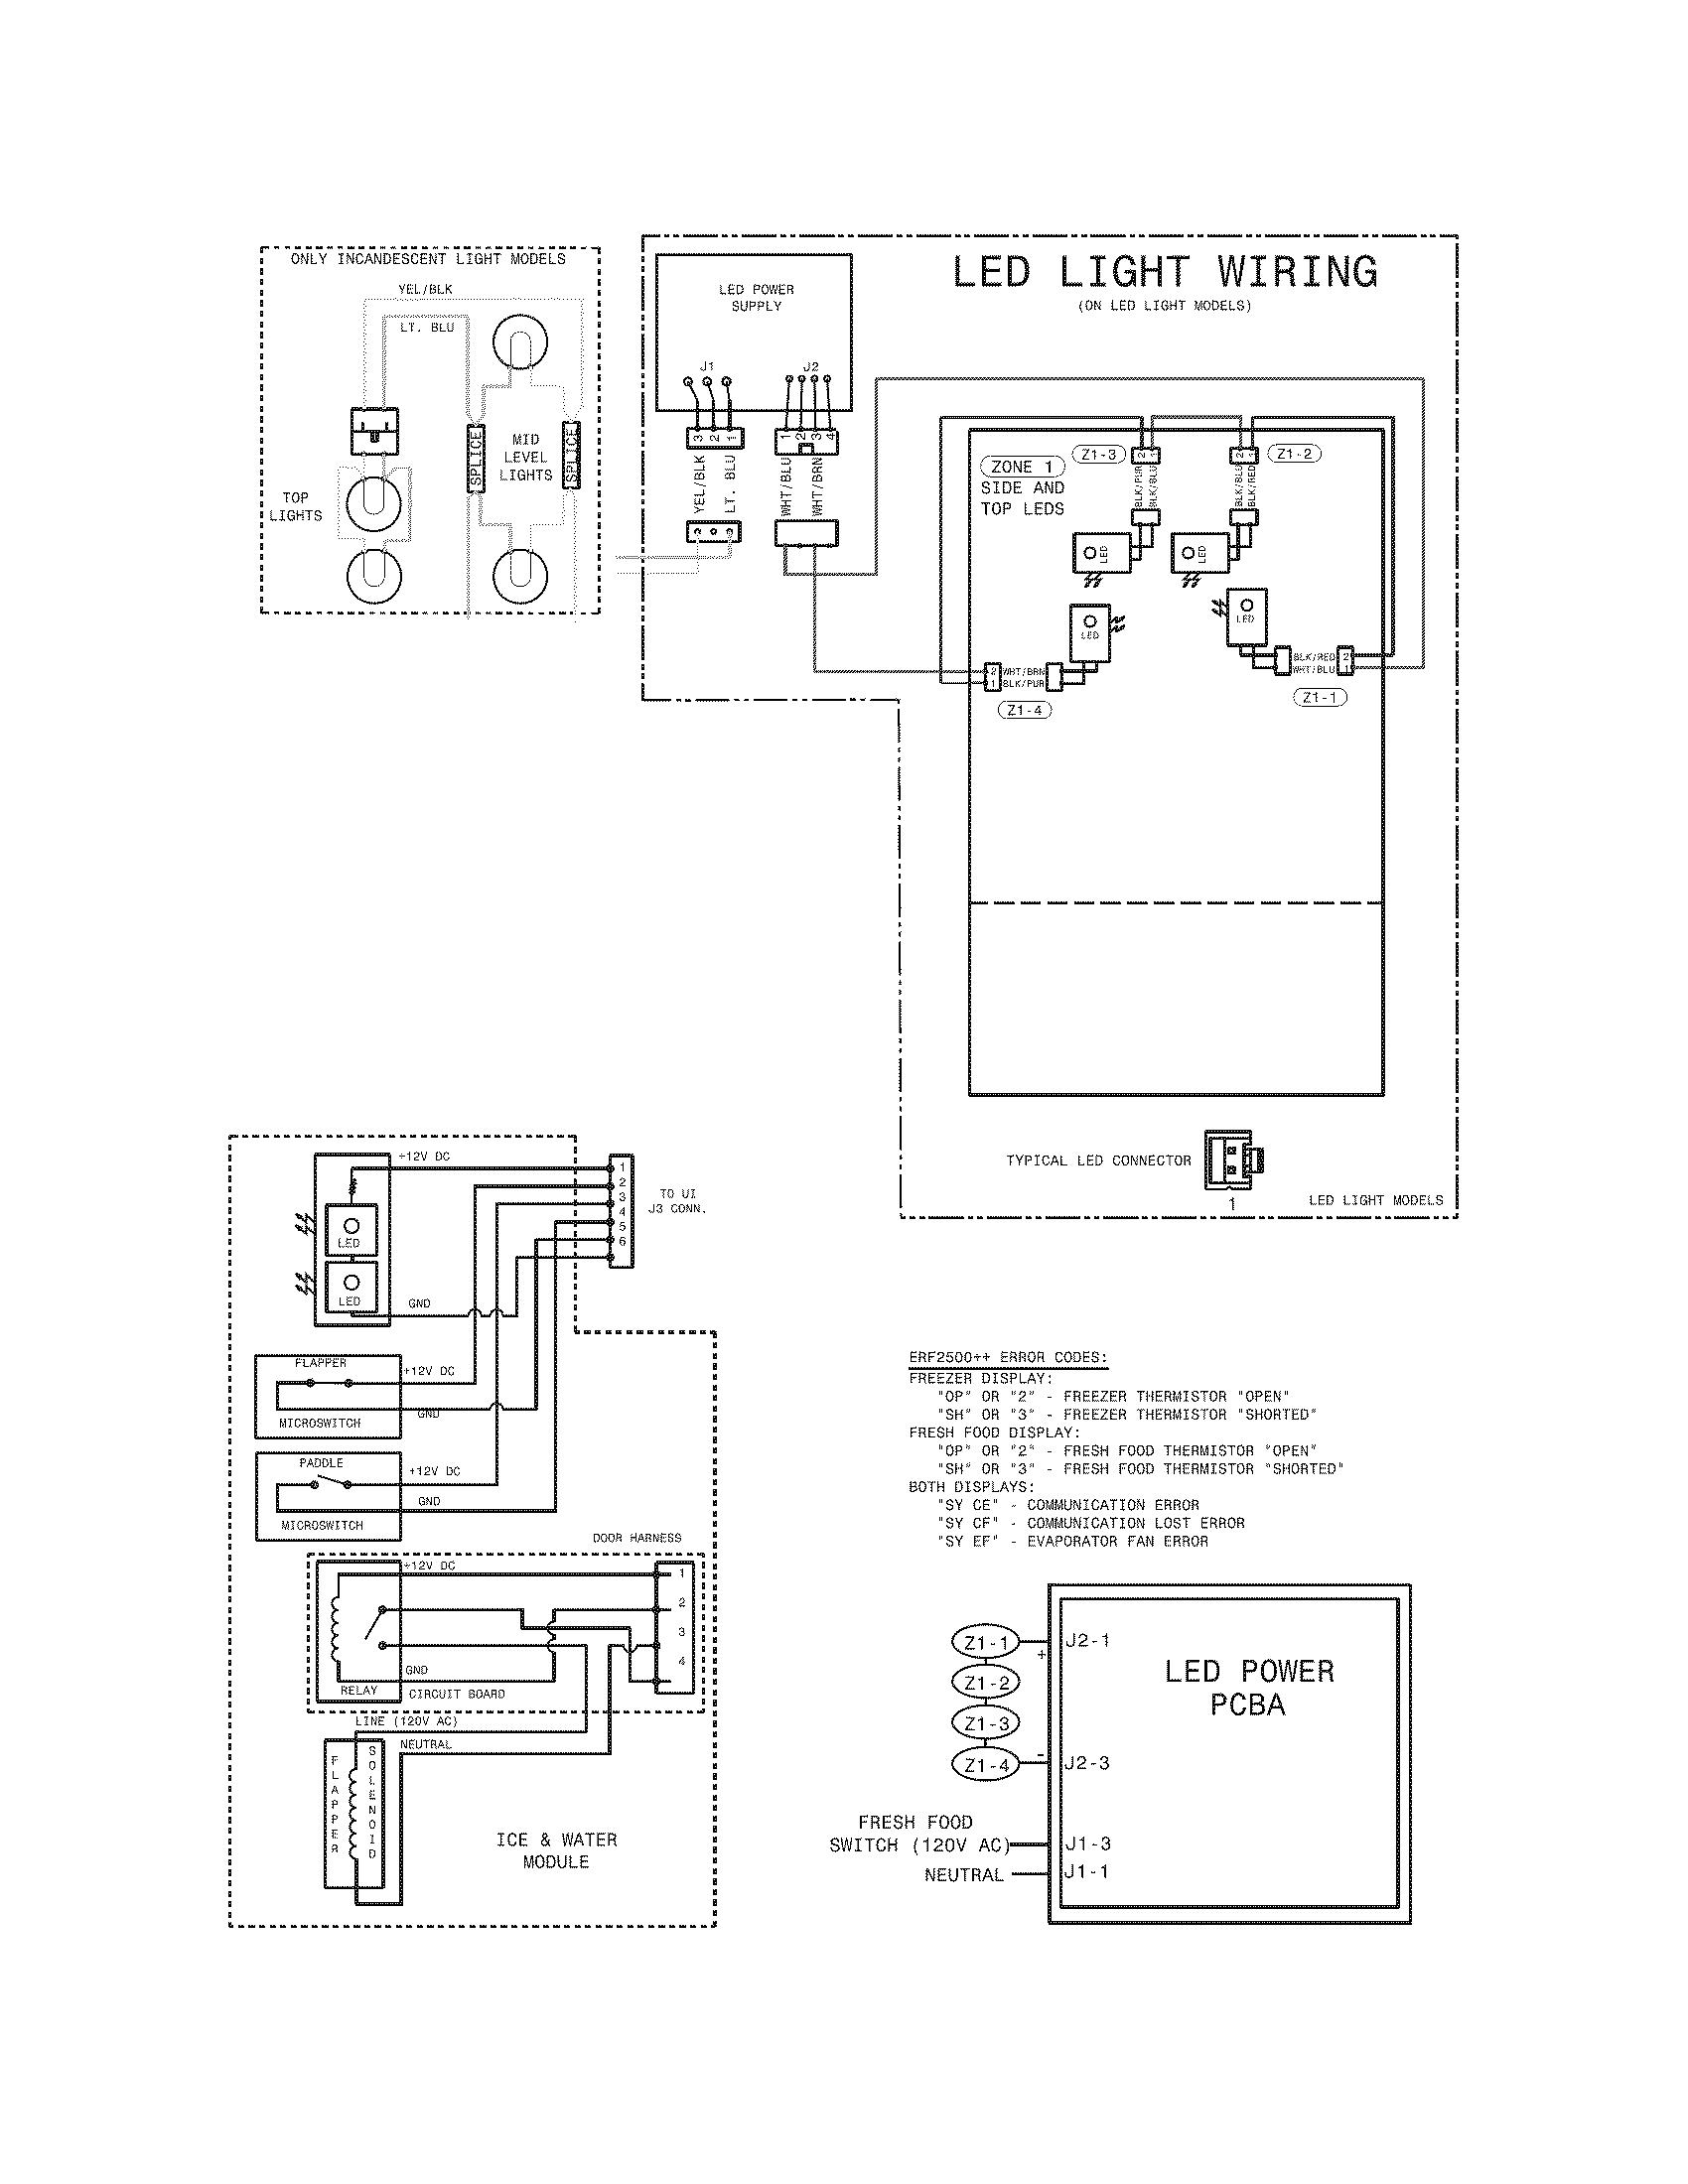 Frigidaire model FGHB2844LFE bottom-mount refrigerator